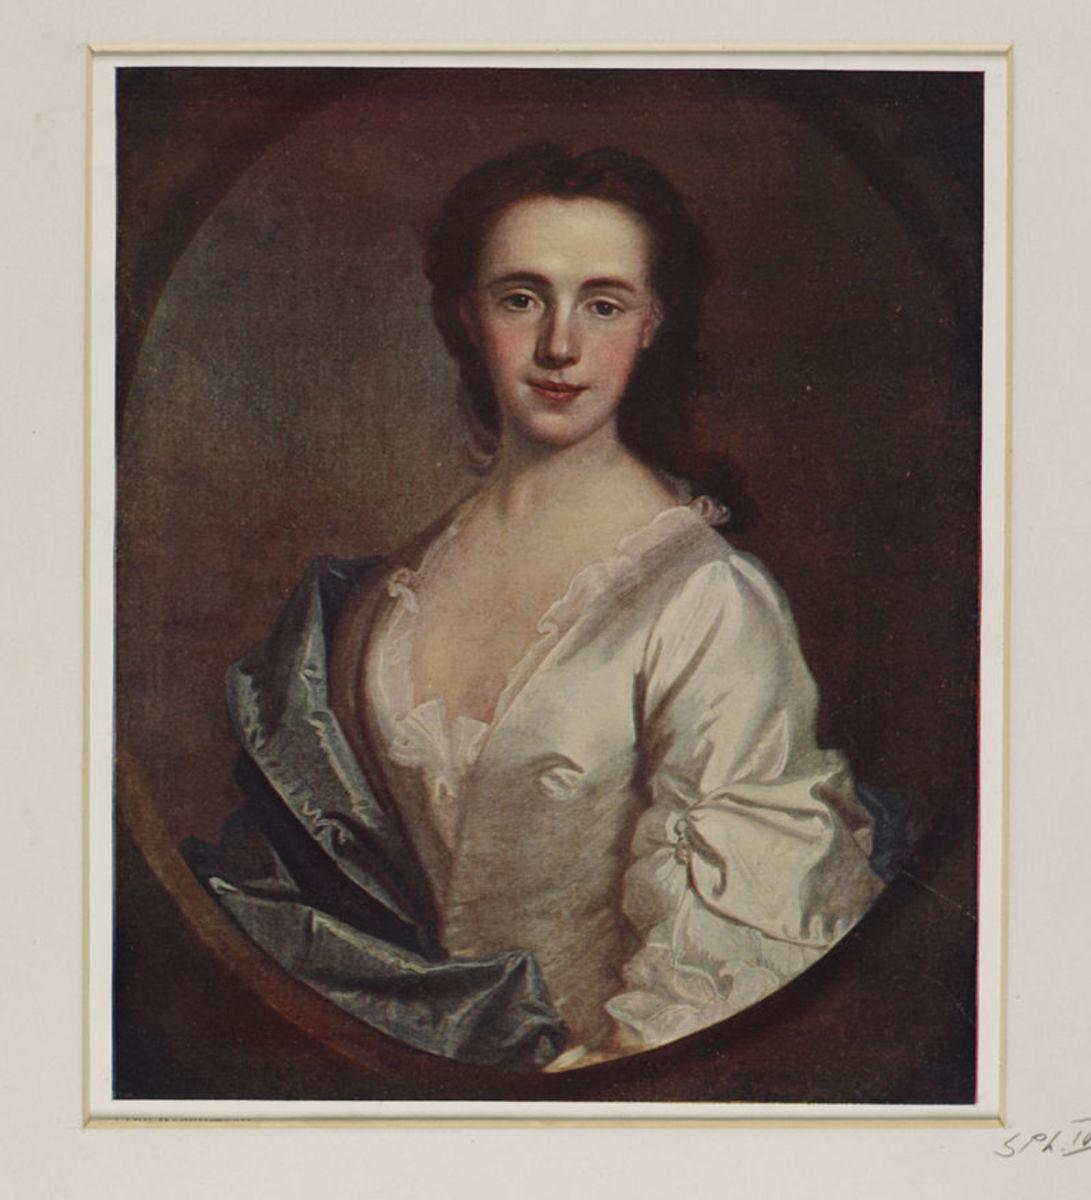 Lady Anne Farquharson-MacKintosh